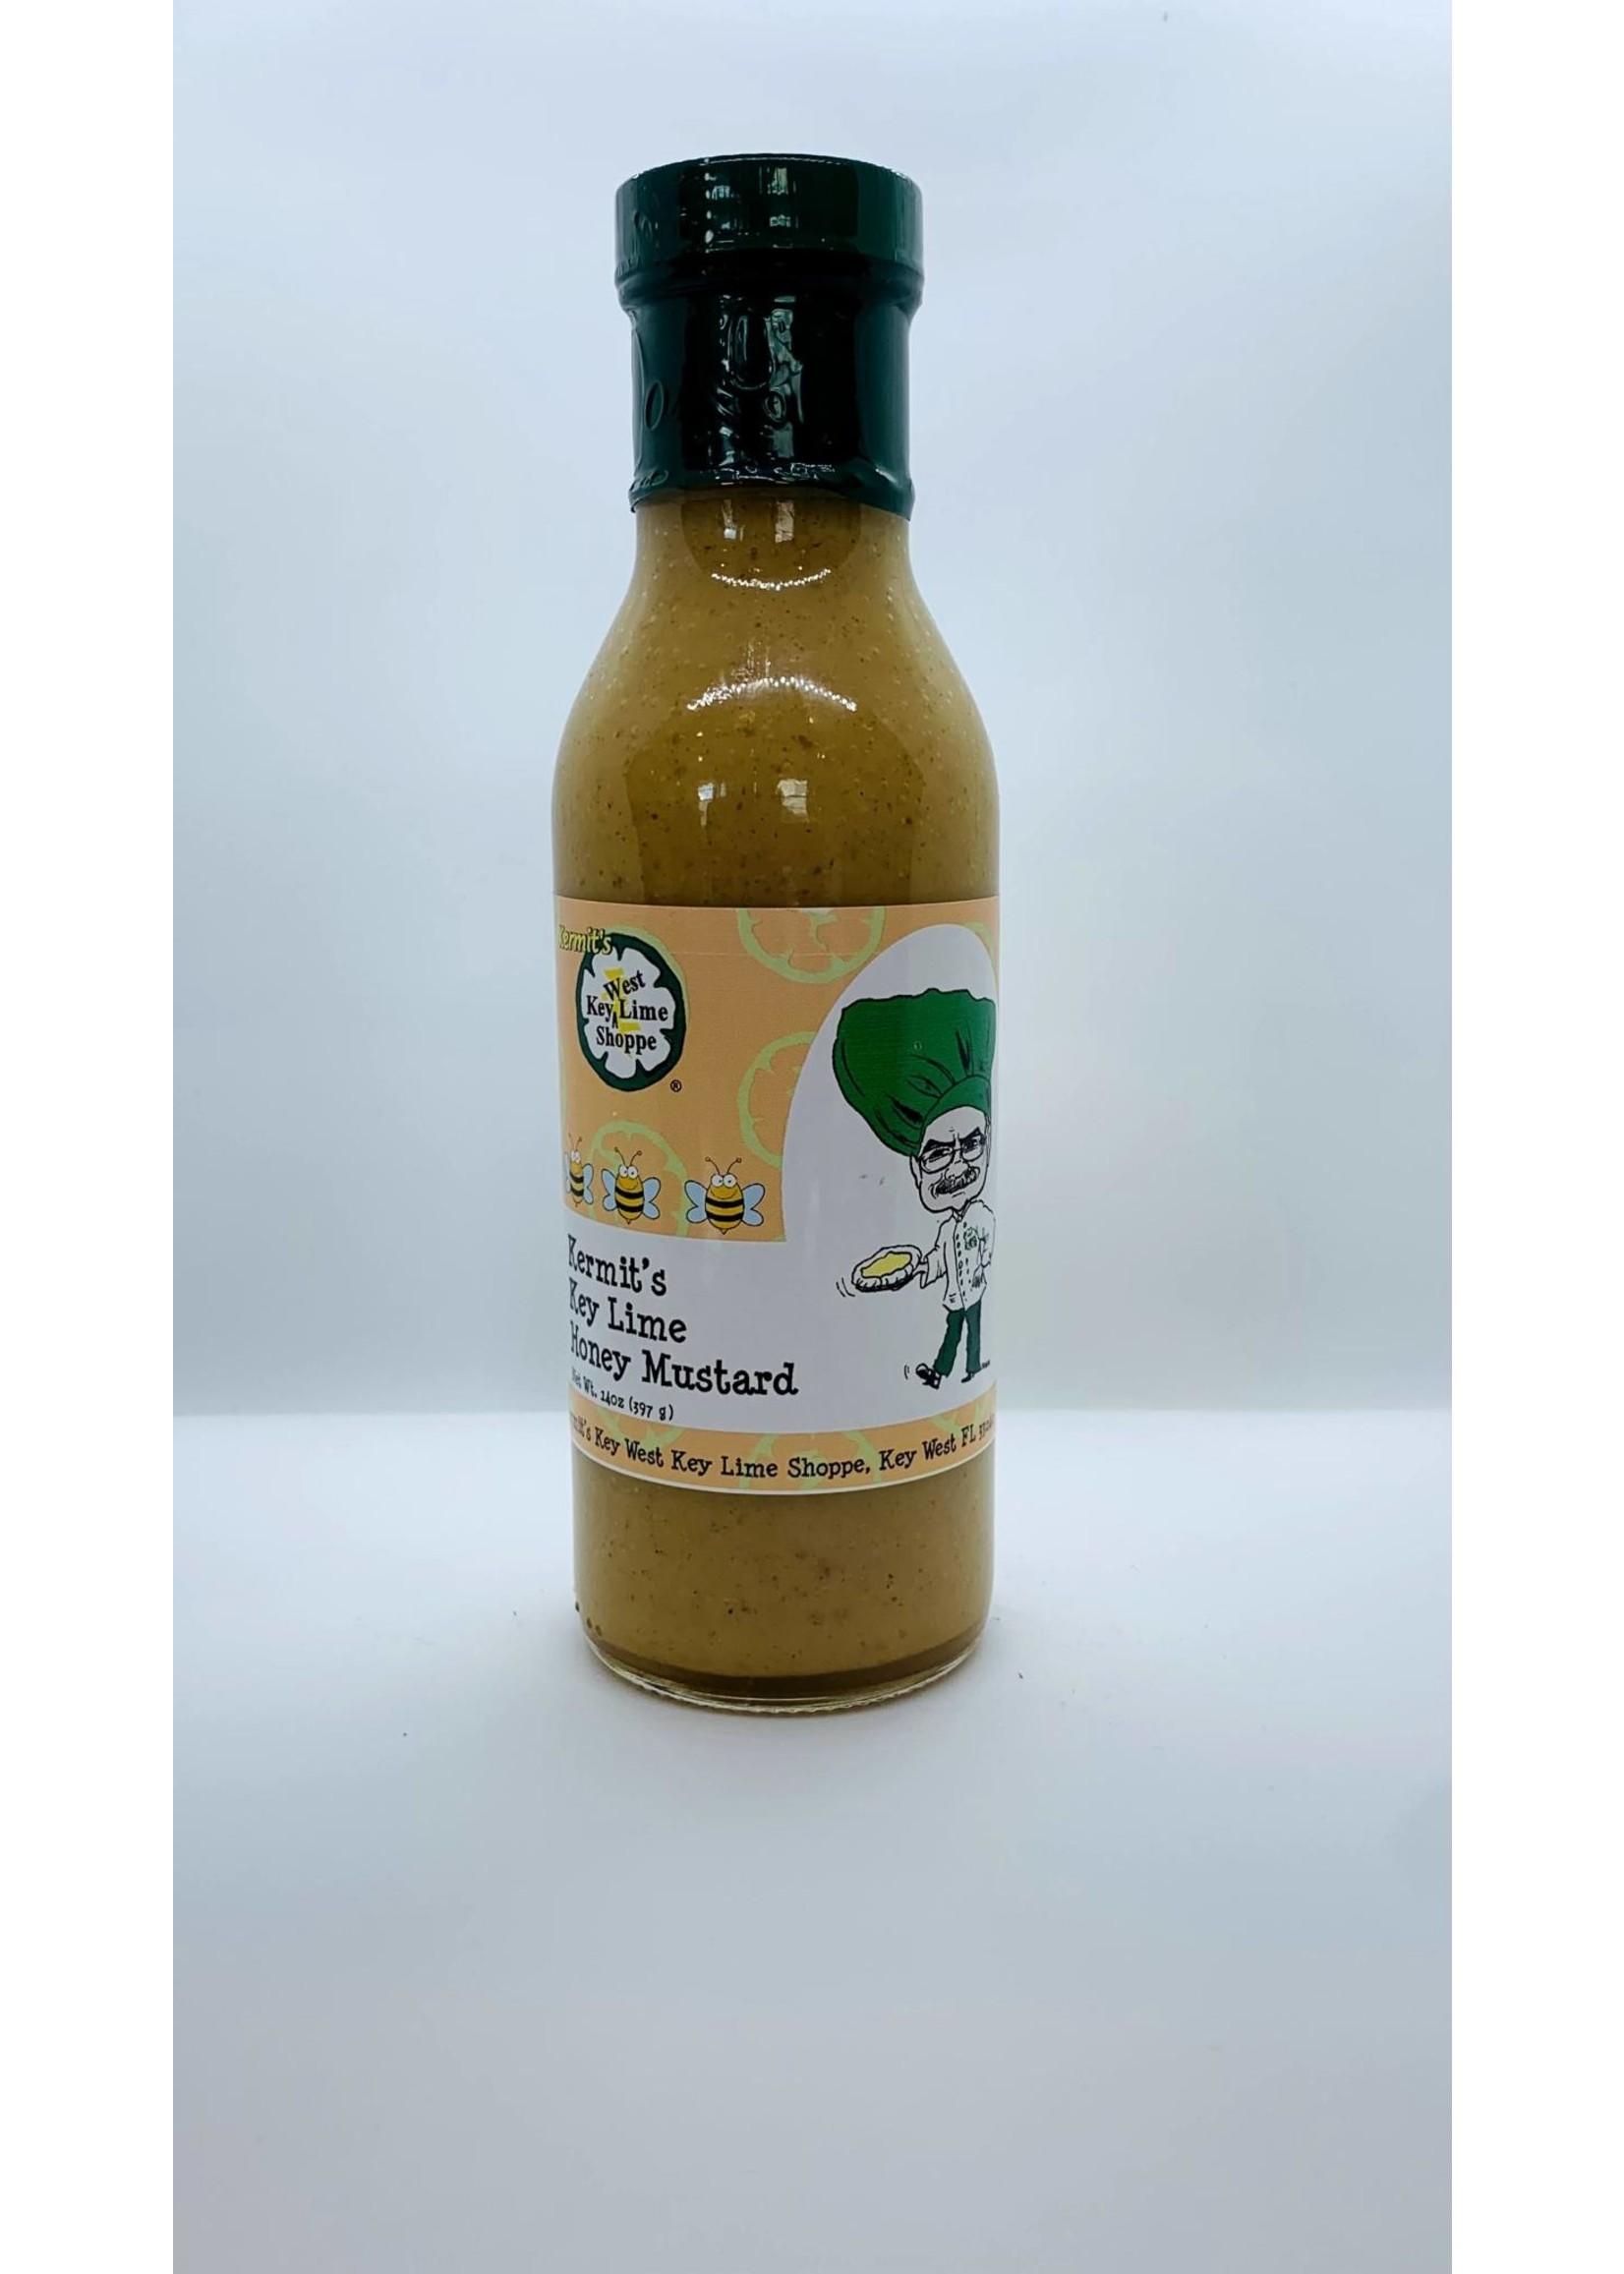 Kermit's Key Lime Honey Mustard - 14 oz